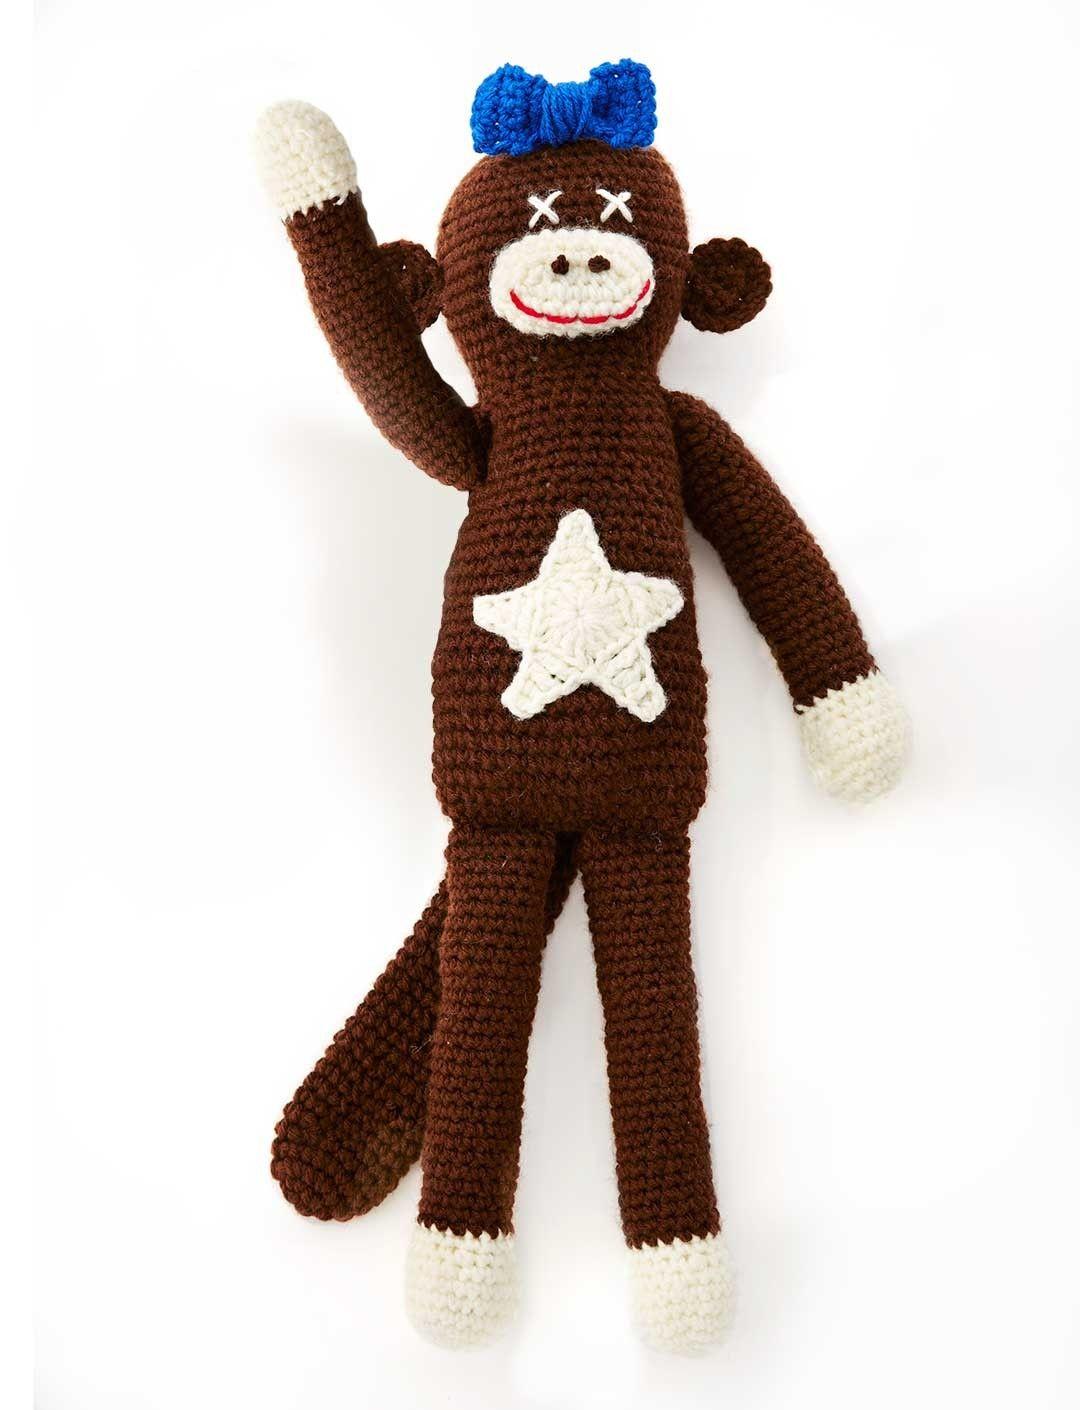 Amigurumi Lucy The Monkey (Crochet) - Free English Pattern | Crochet ...